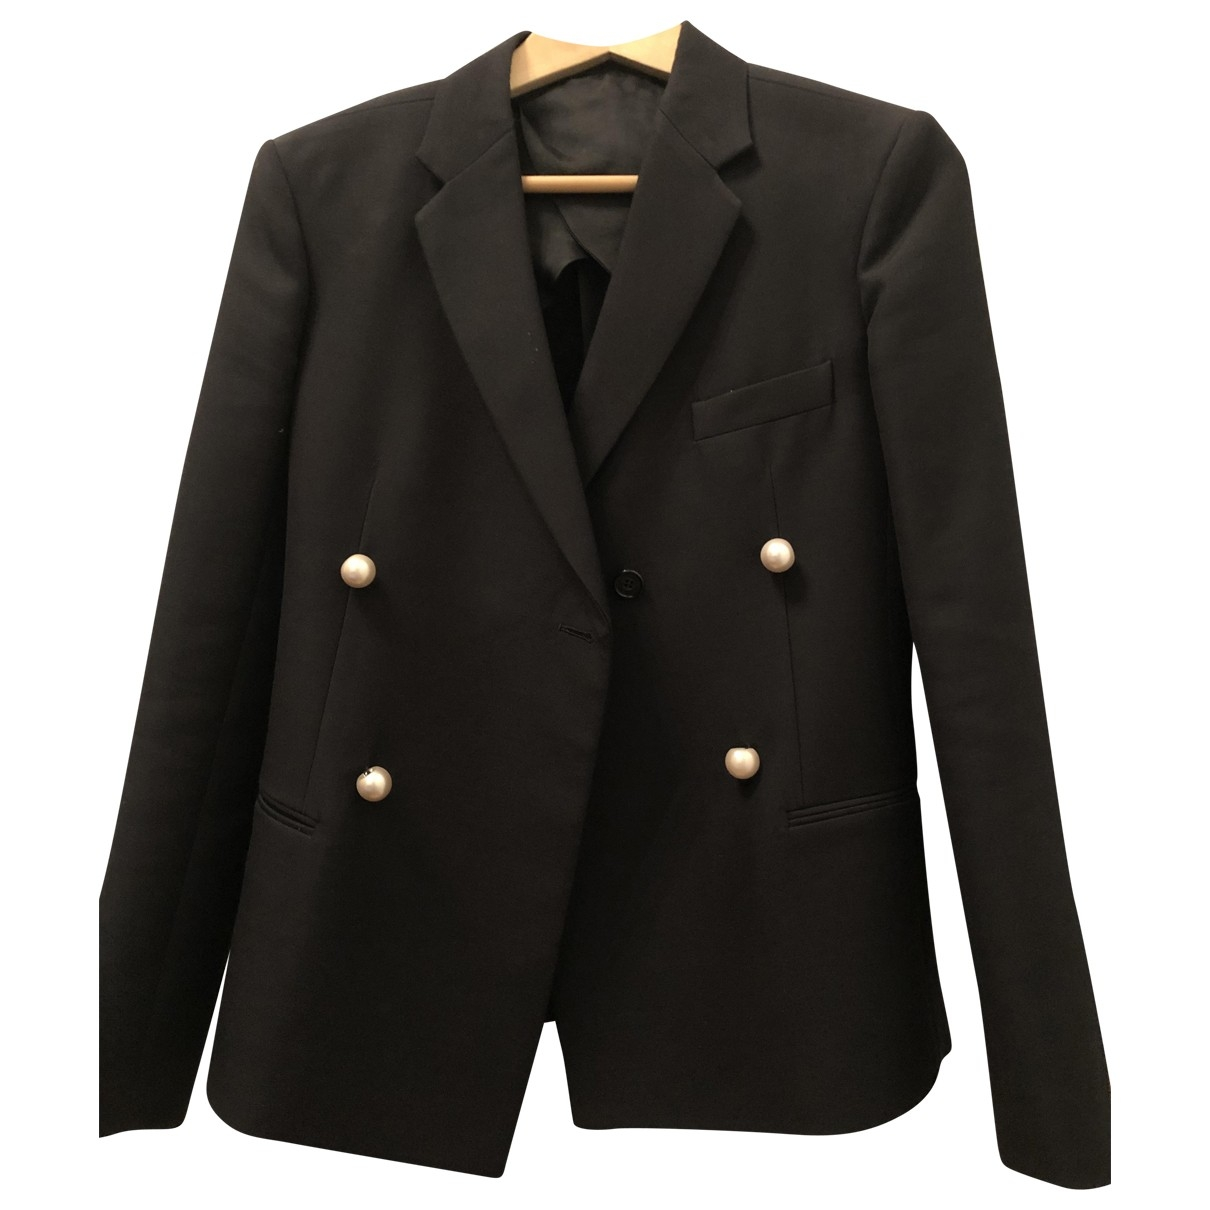 Celine \N Black jacket for Women 36 FR